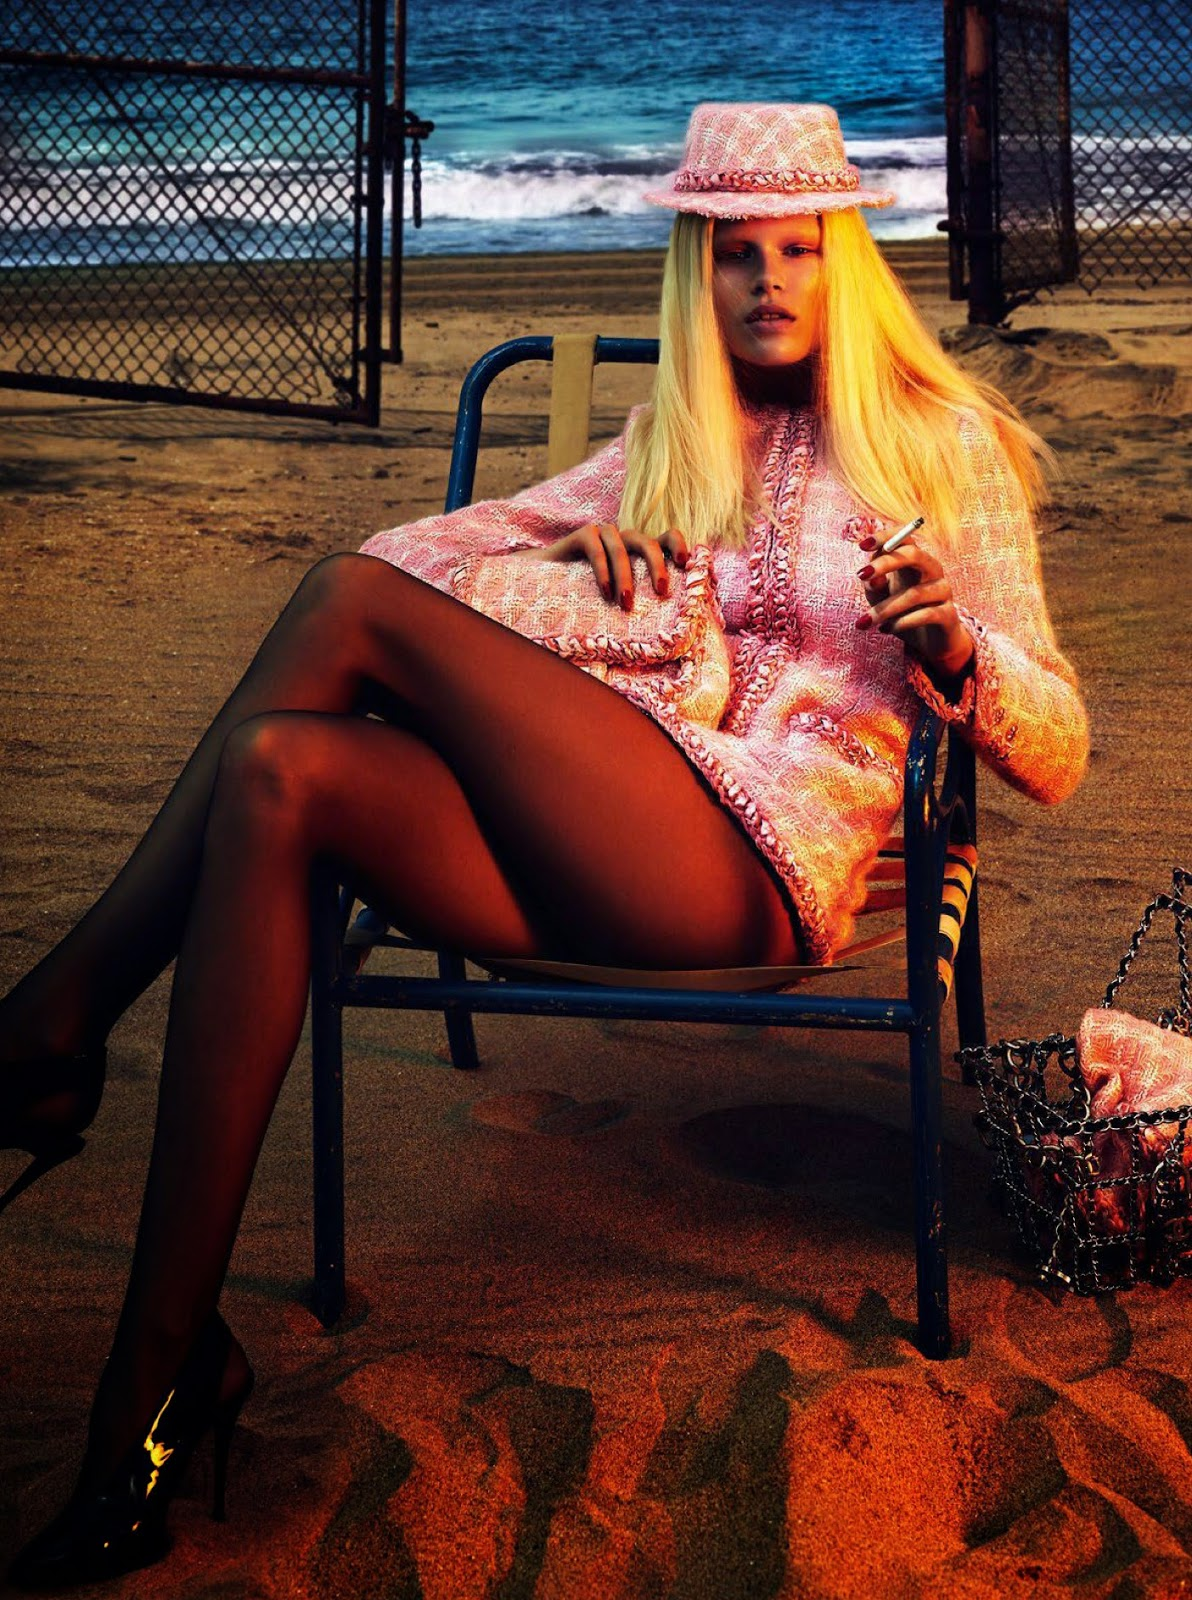 Vanessa Paradis Nude Sexy - 7 Photos - 2019 year